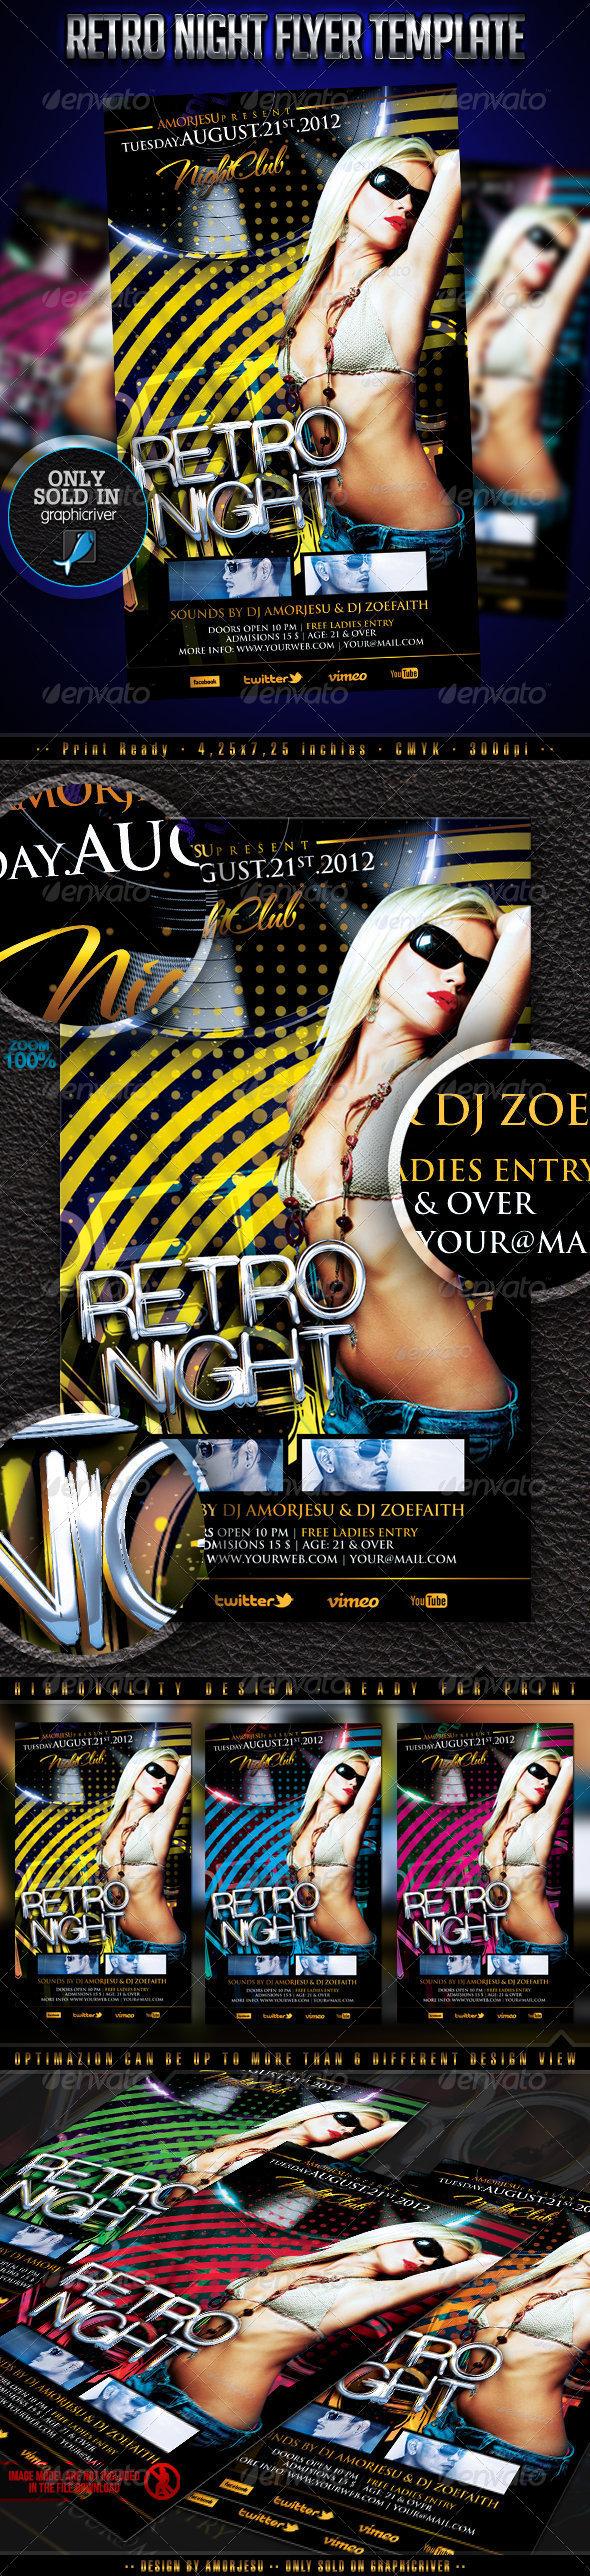 Retro Night Flyer Template